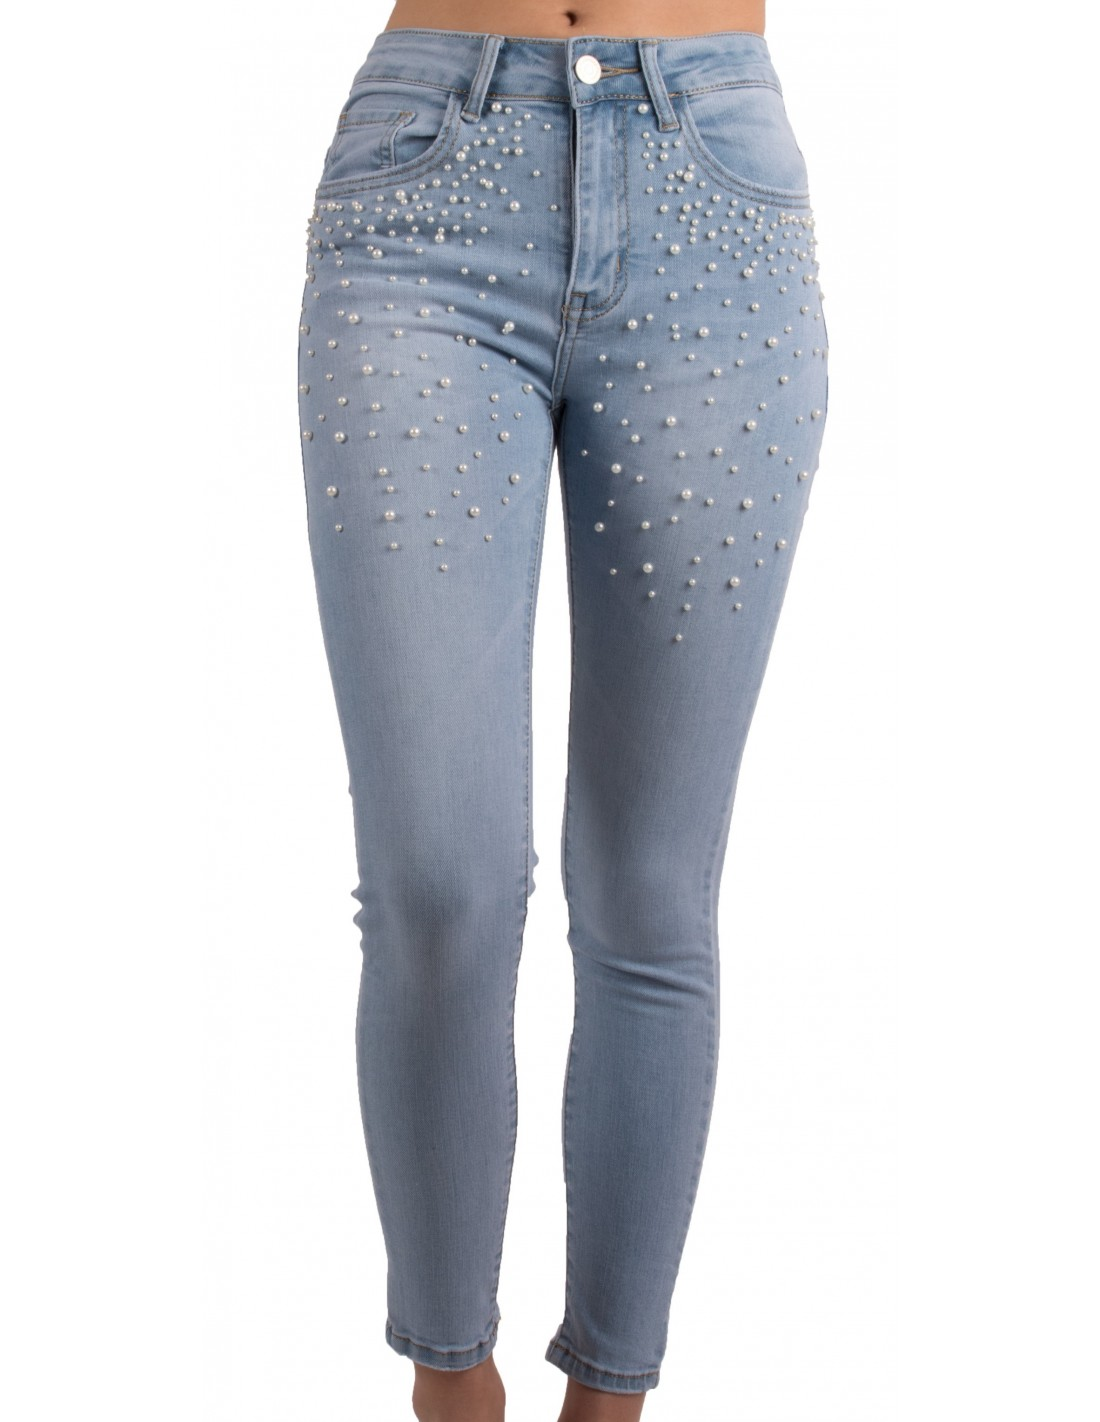 jean slim femme taille haute perles coloris jean bleu clair. Black Bedroom Furniture Sets. Home Design Ideas